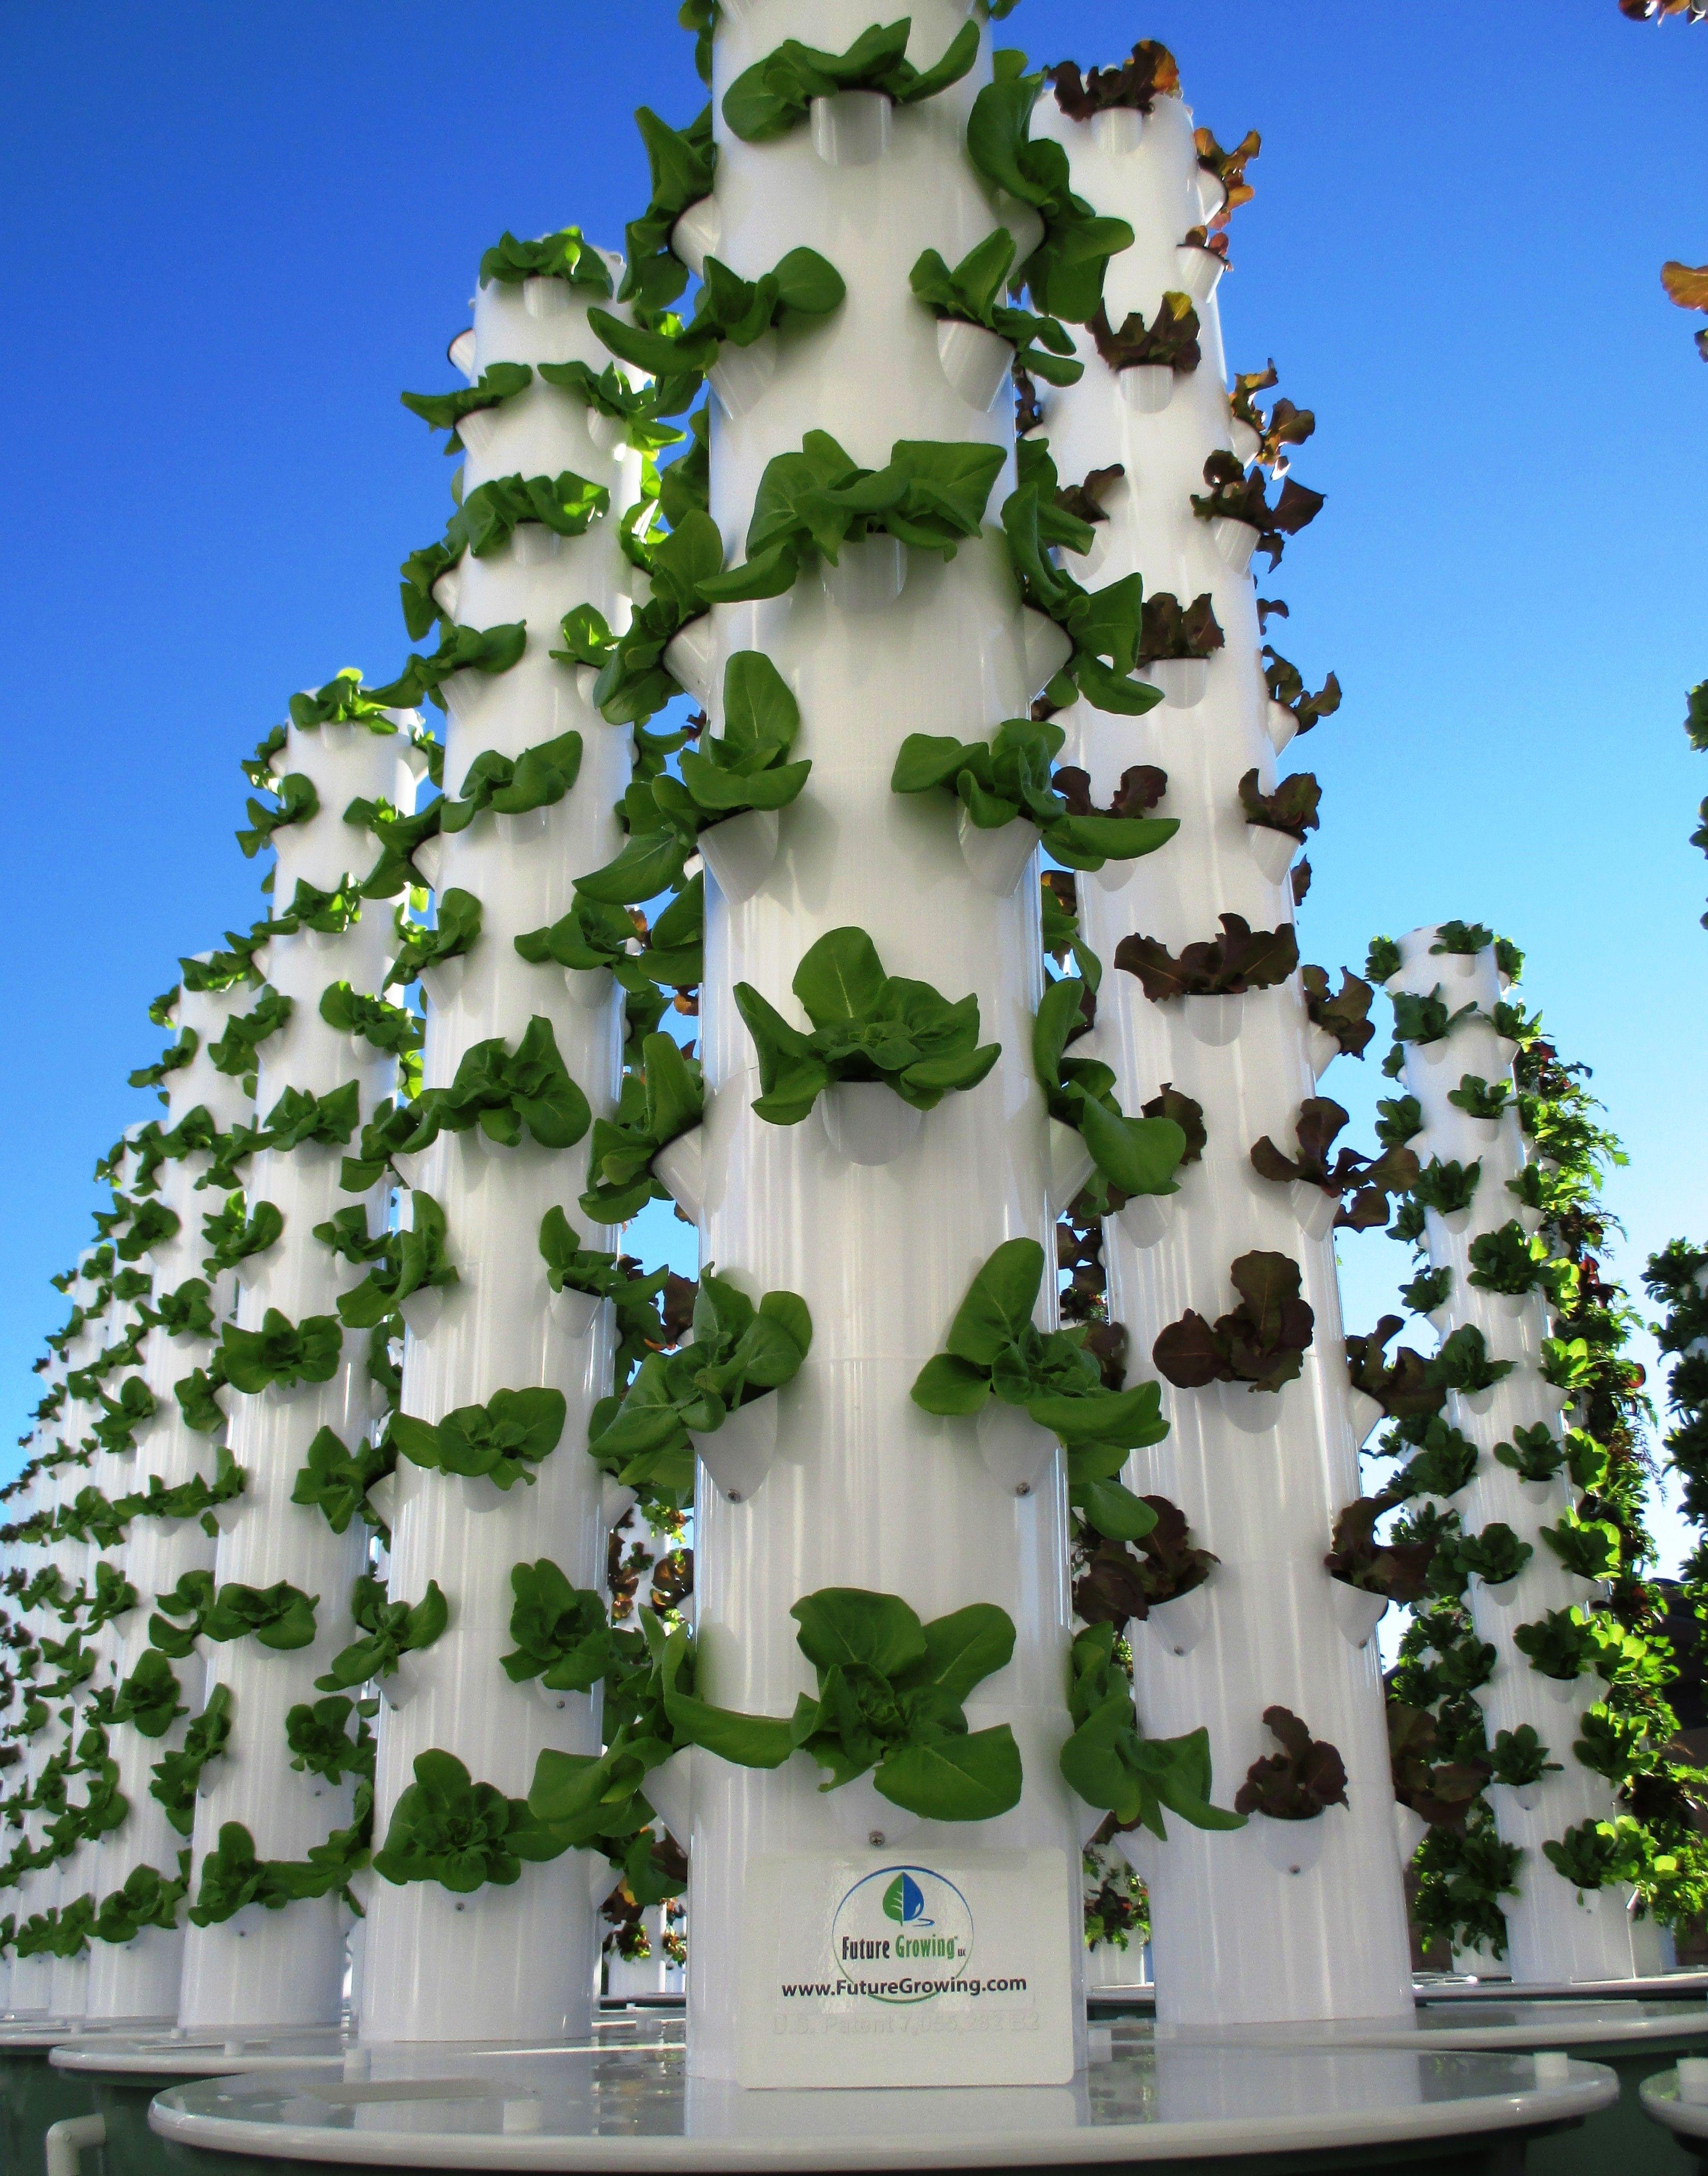 True Garden Tower Gardens AZ 01 | Hydroponics | Pinterest ...